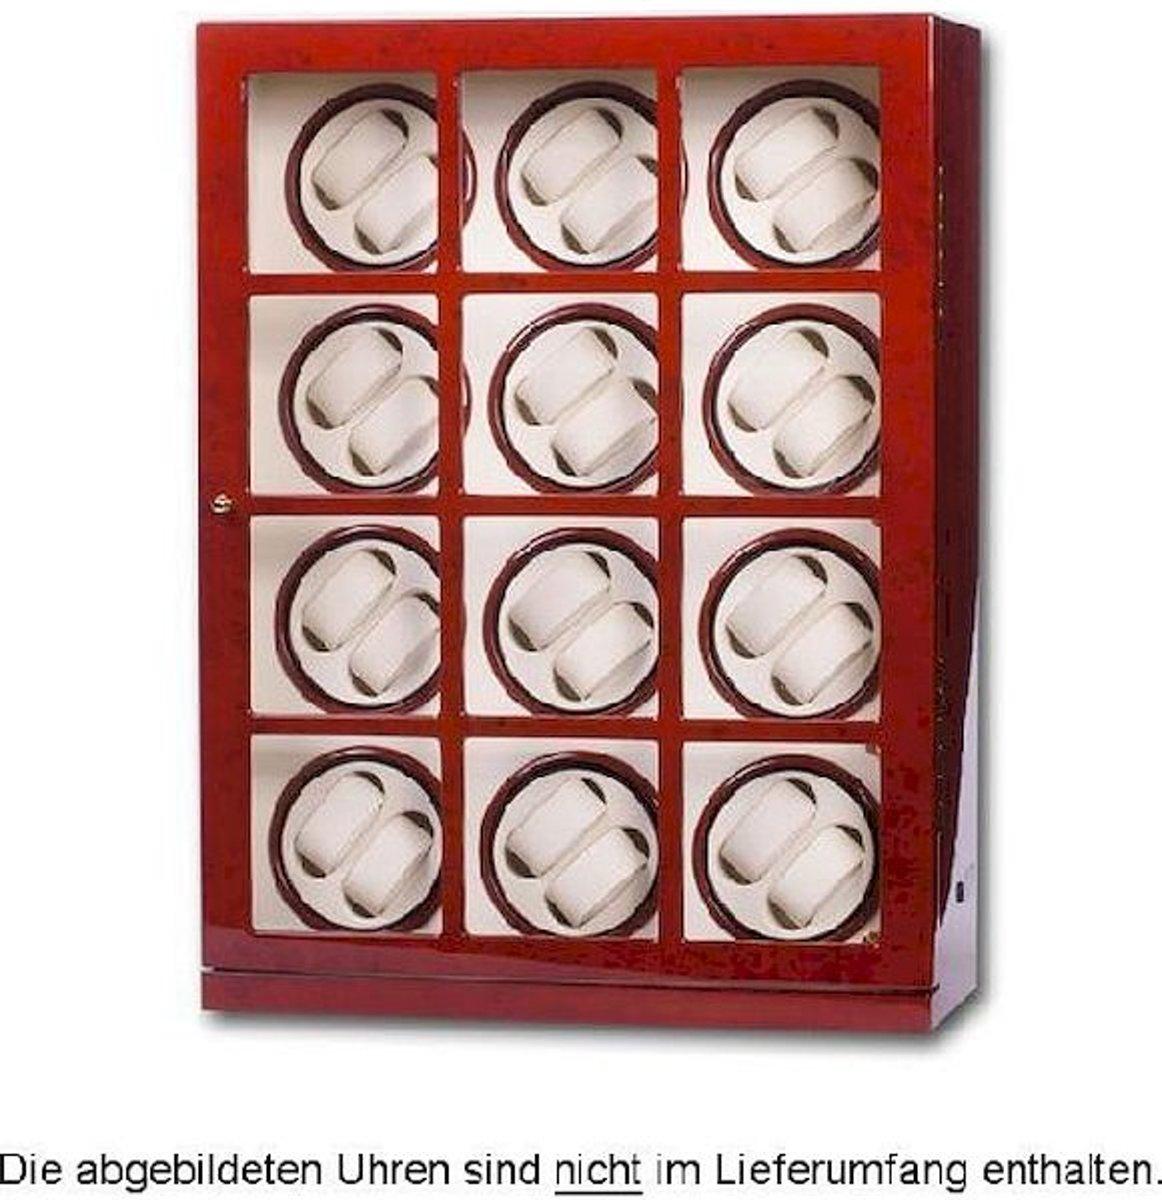 Portax Watchwinder Collector 24 Uhren Wurzelholz 1002216001 kopen